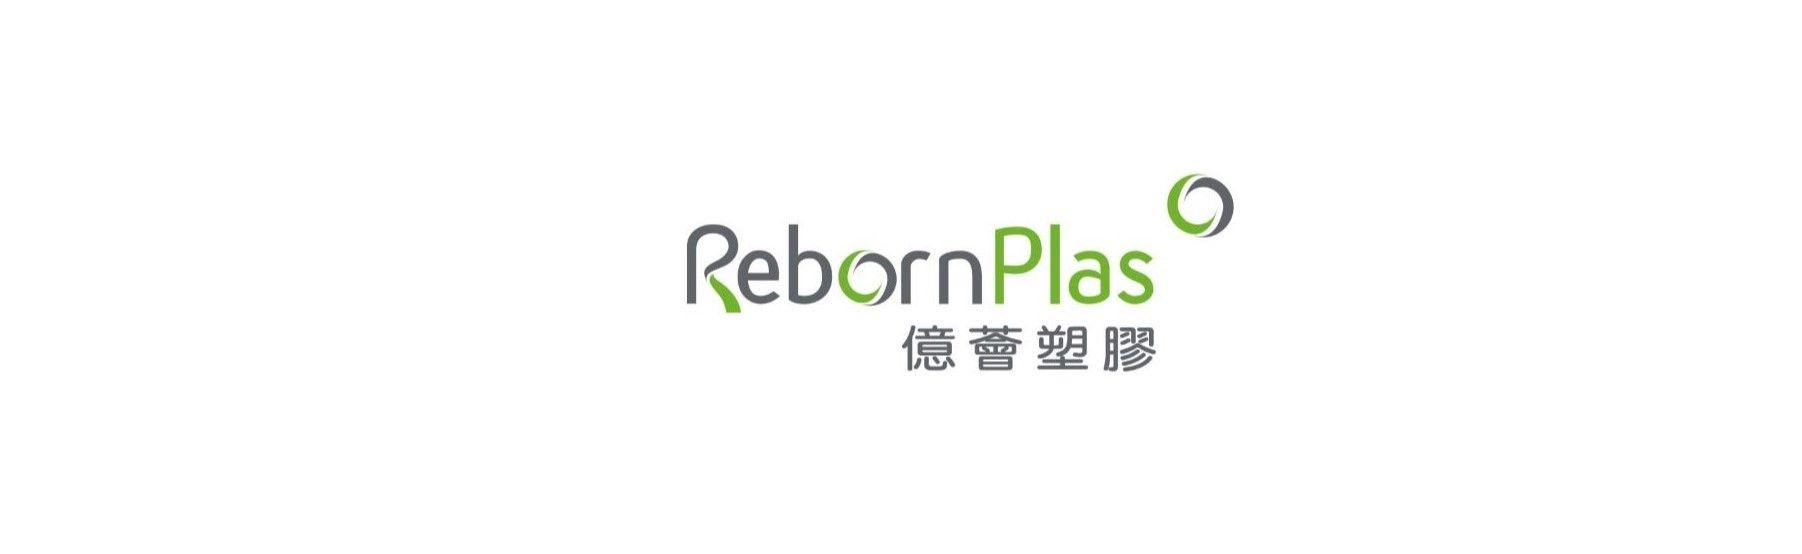 RebornPlas Composites Co., Ltd